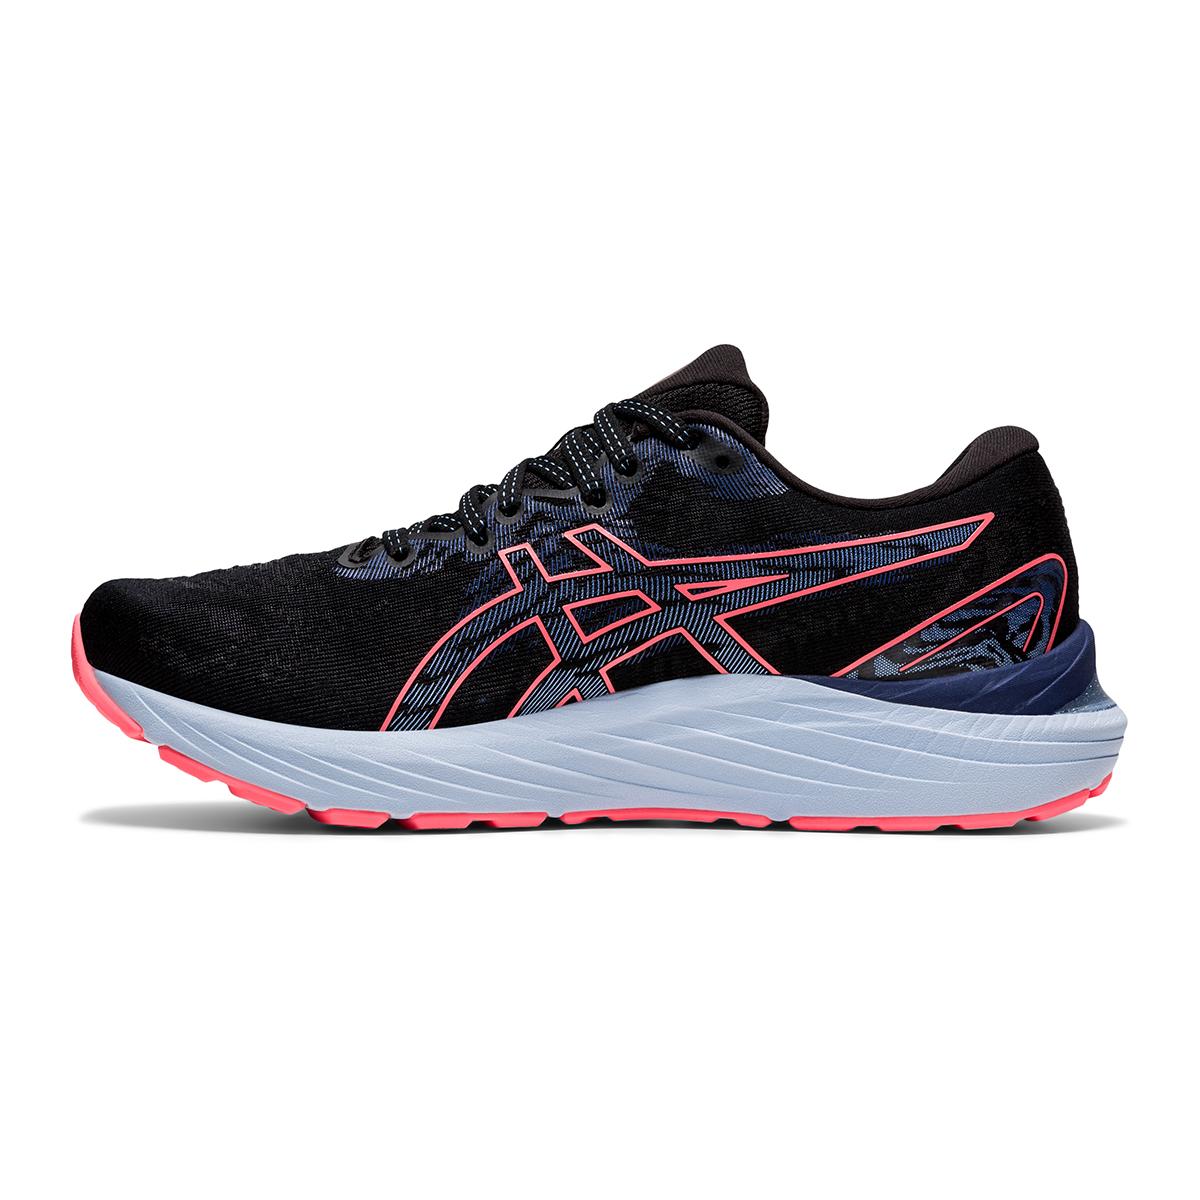 Women's Asics Gel-Cumulus 23 Running Shoe - Color: Black/Blazing Coral - Size: 5 - Width: Regular, Black/Blazing Coral, large, image 2